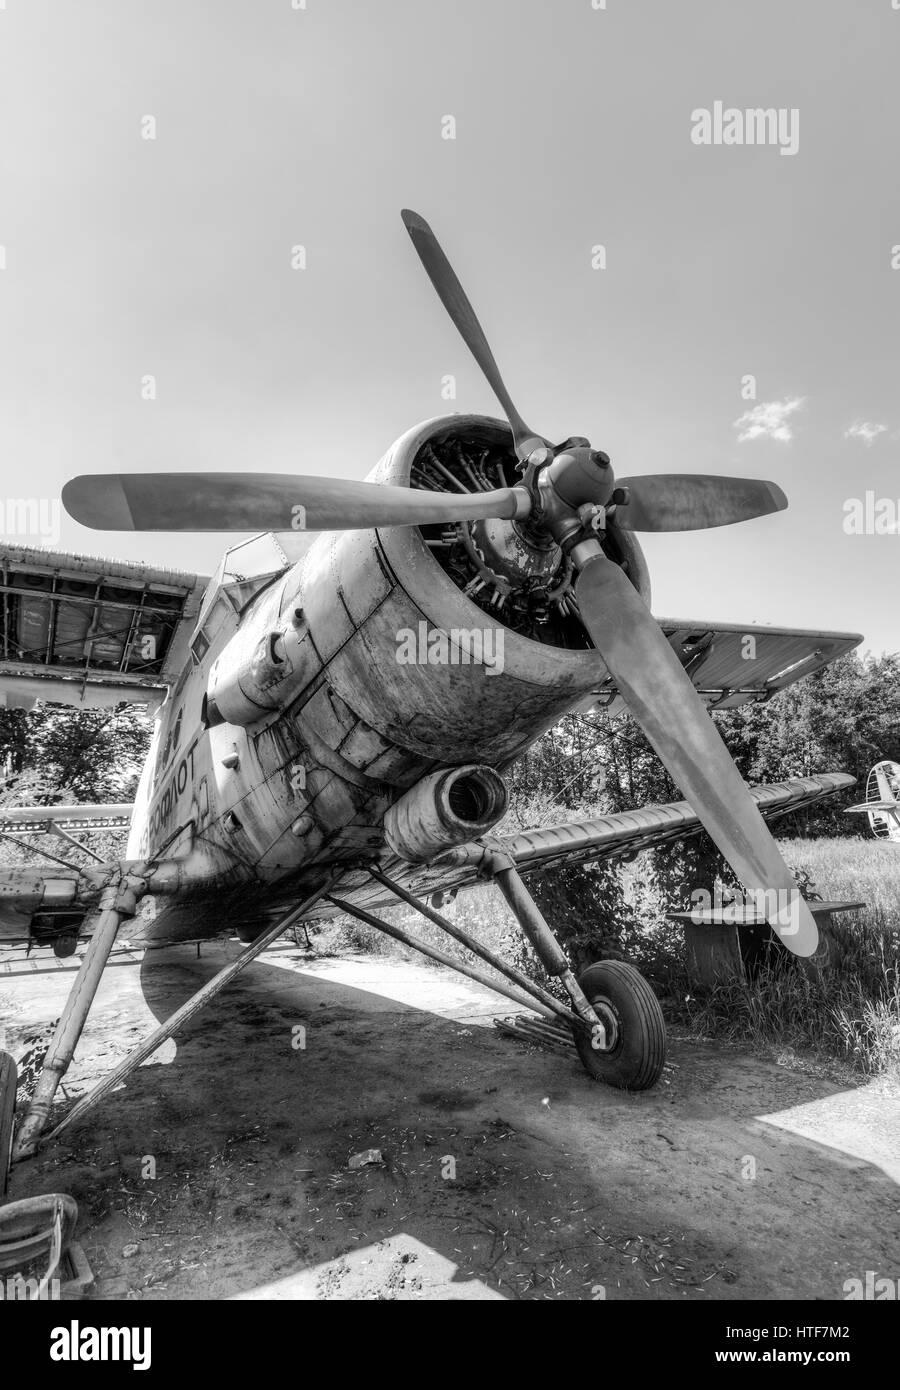 SAMARA, RUSSIA - MAY 22, 2015: The Antonov An-2 a Soviet mass-produced single-engine biplane at an abandoned aerodrome - Stock Image